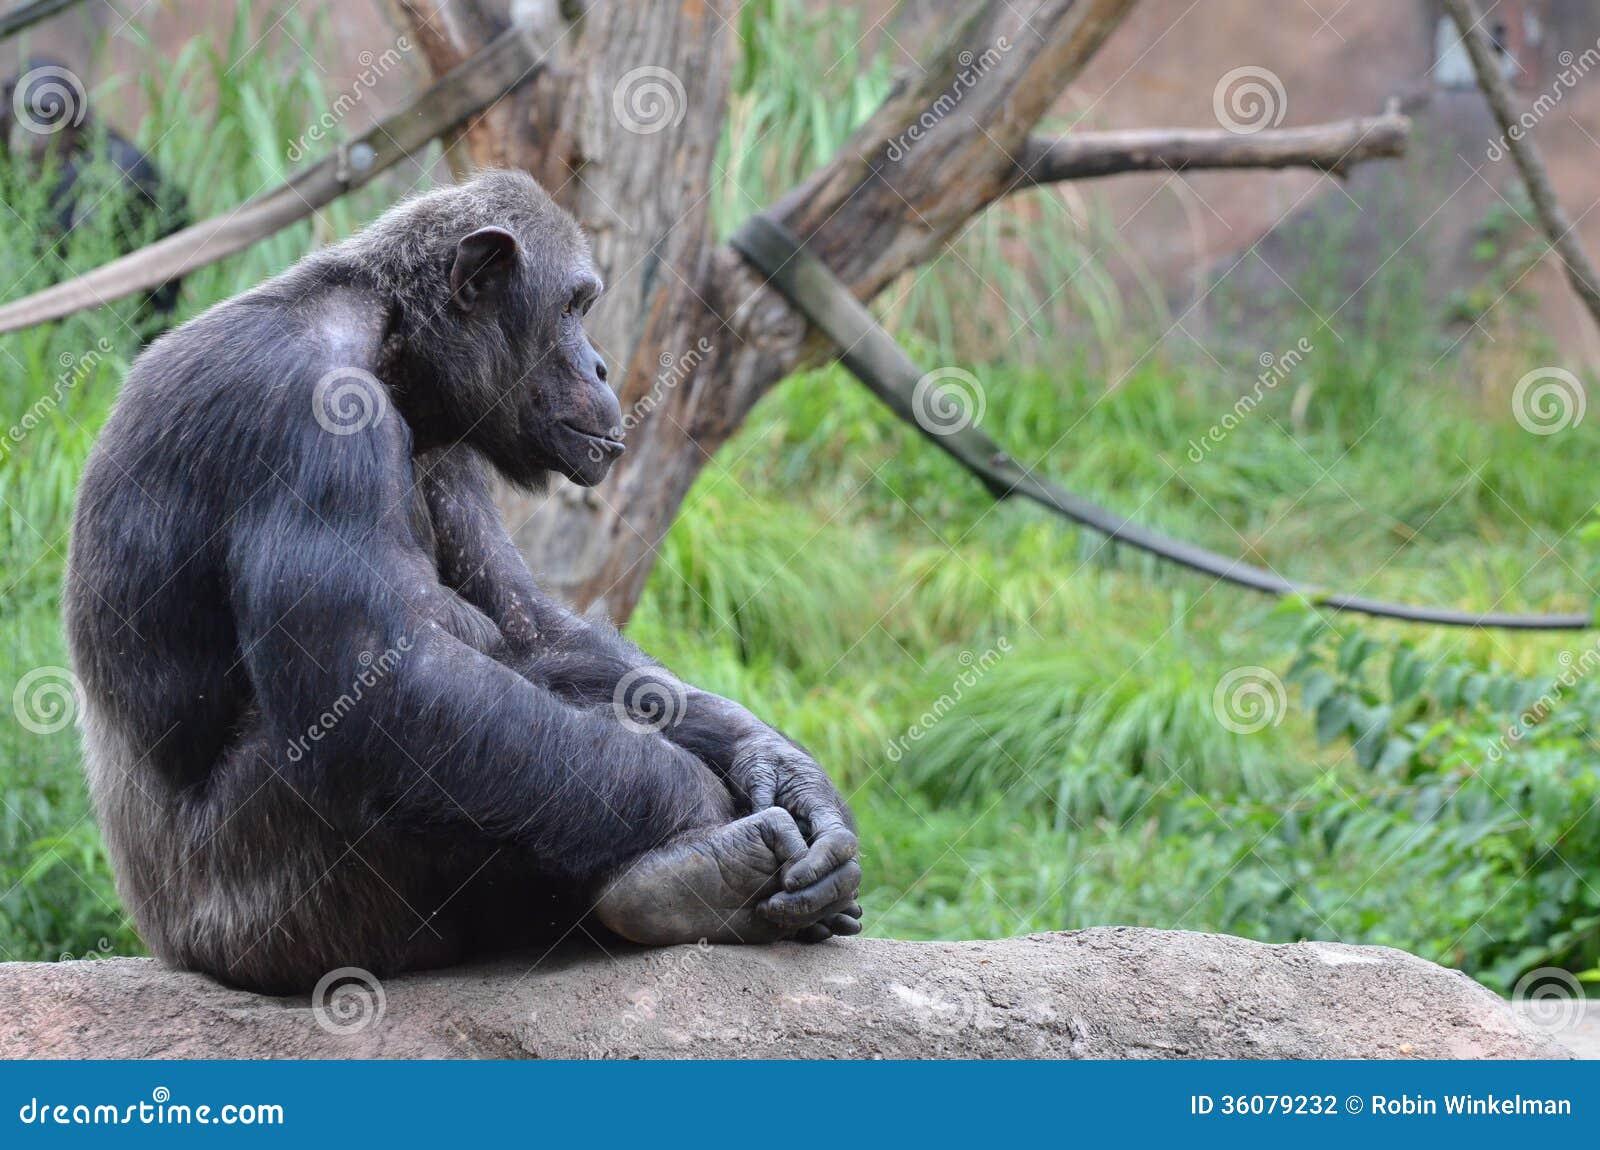 Sitting Male Chimp Stock Photography - Image: 36079232  |Chimp Sitting